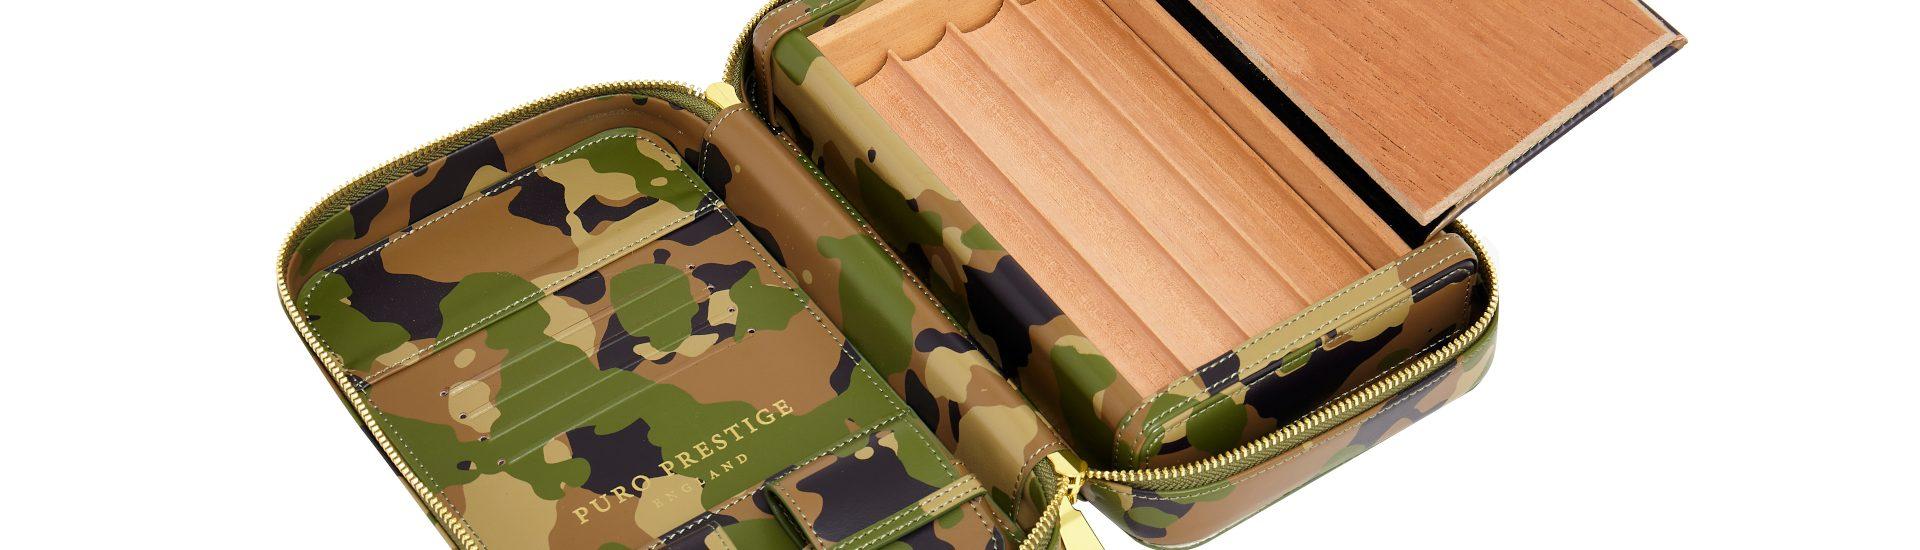 The Churchill Edition Cigar Case